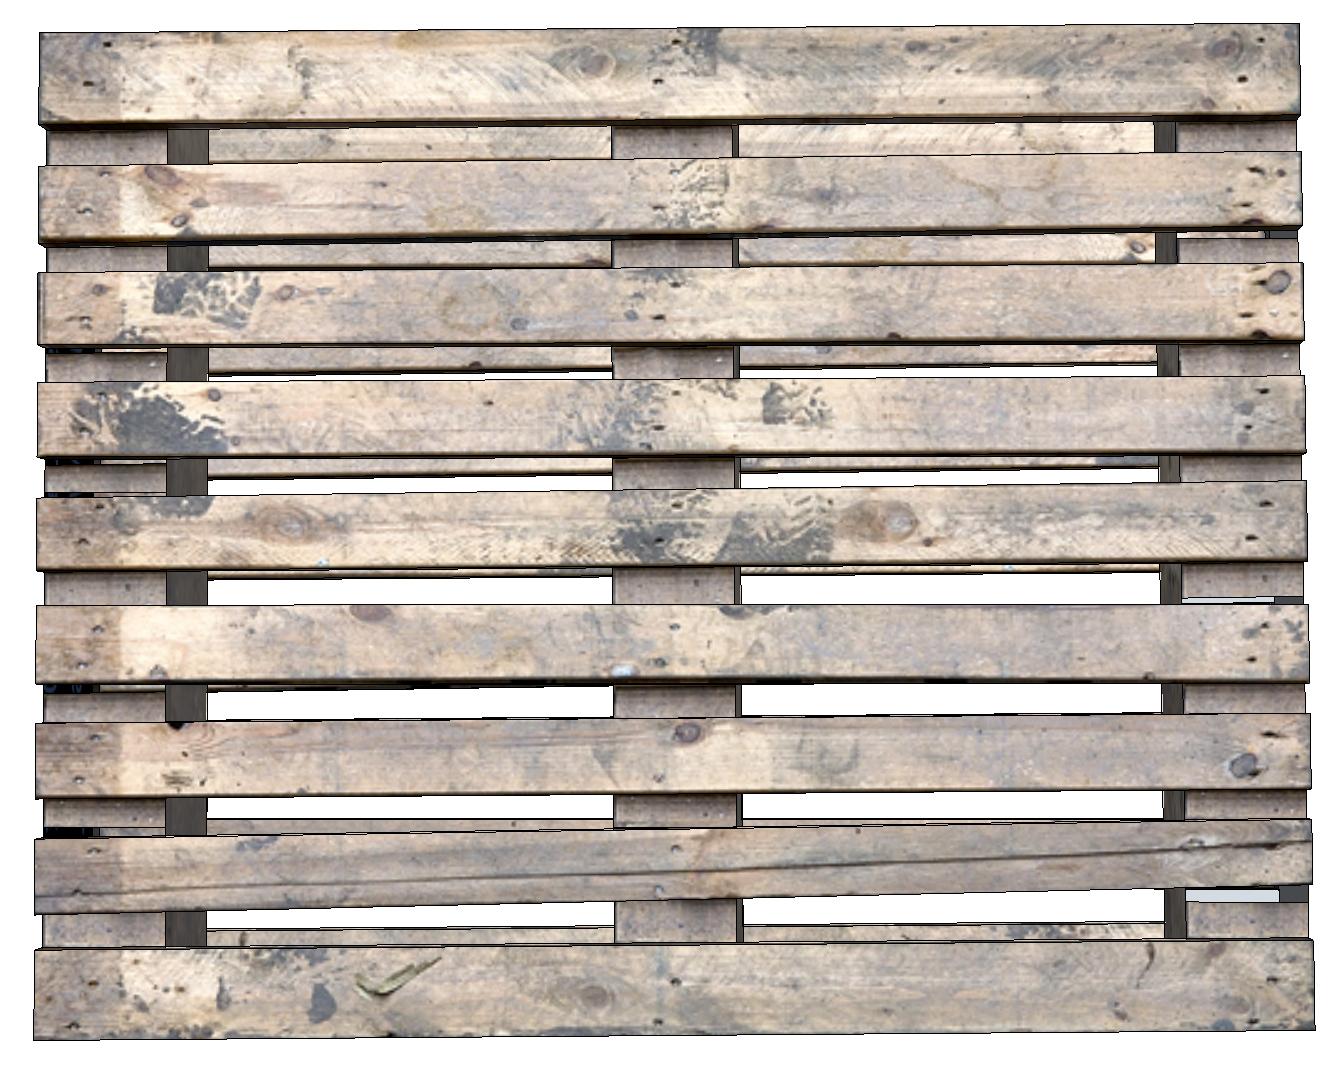 wooden pallet 3d model fbx 131219